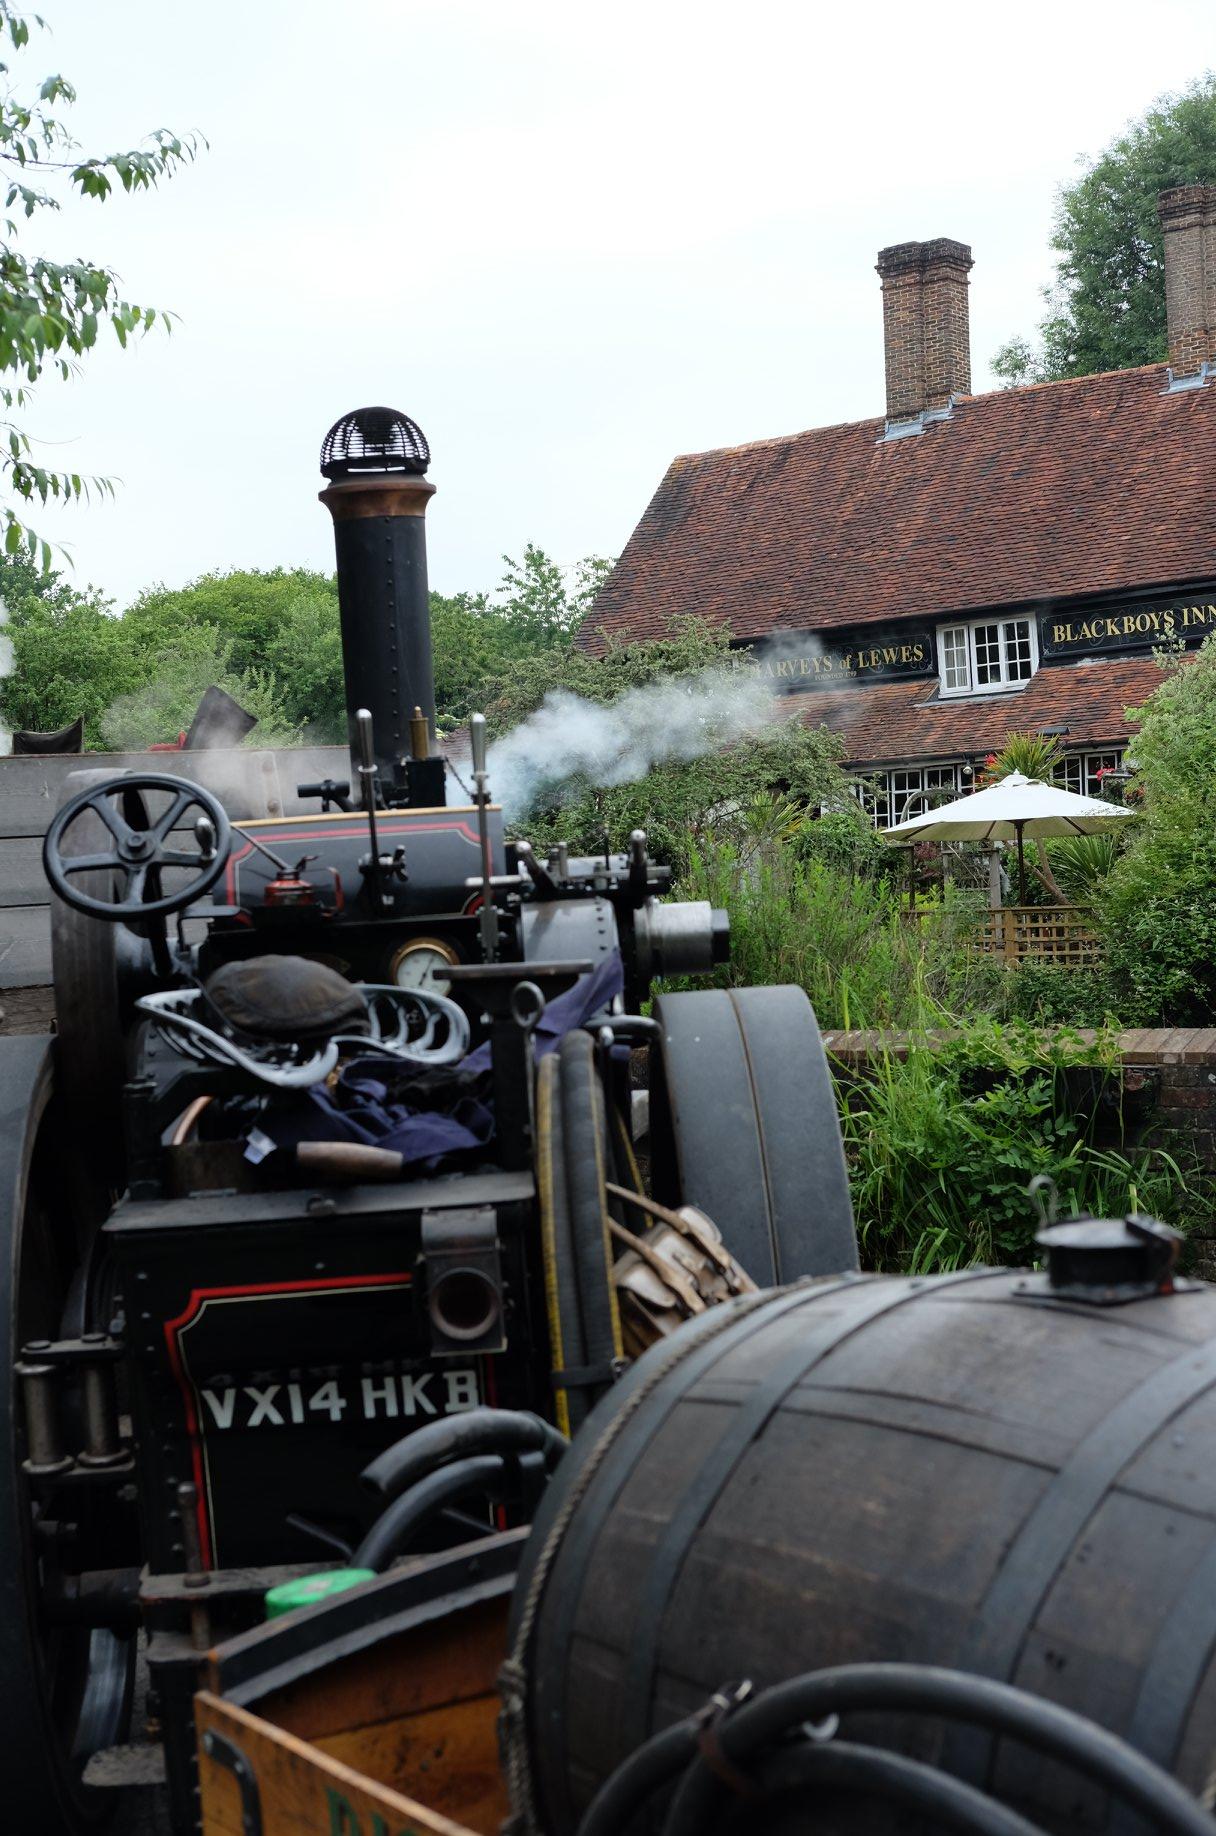 blackboys-inn-steam-engine-rally-8